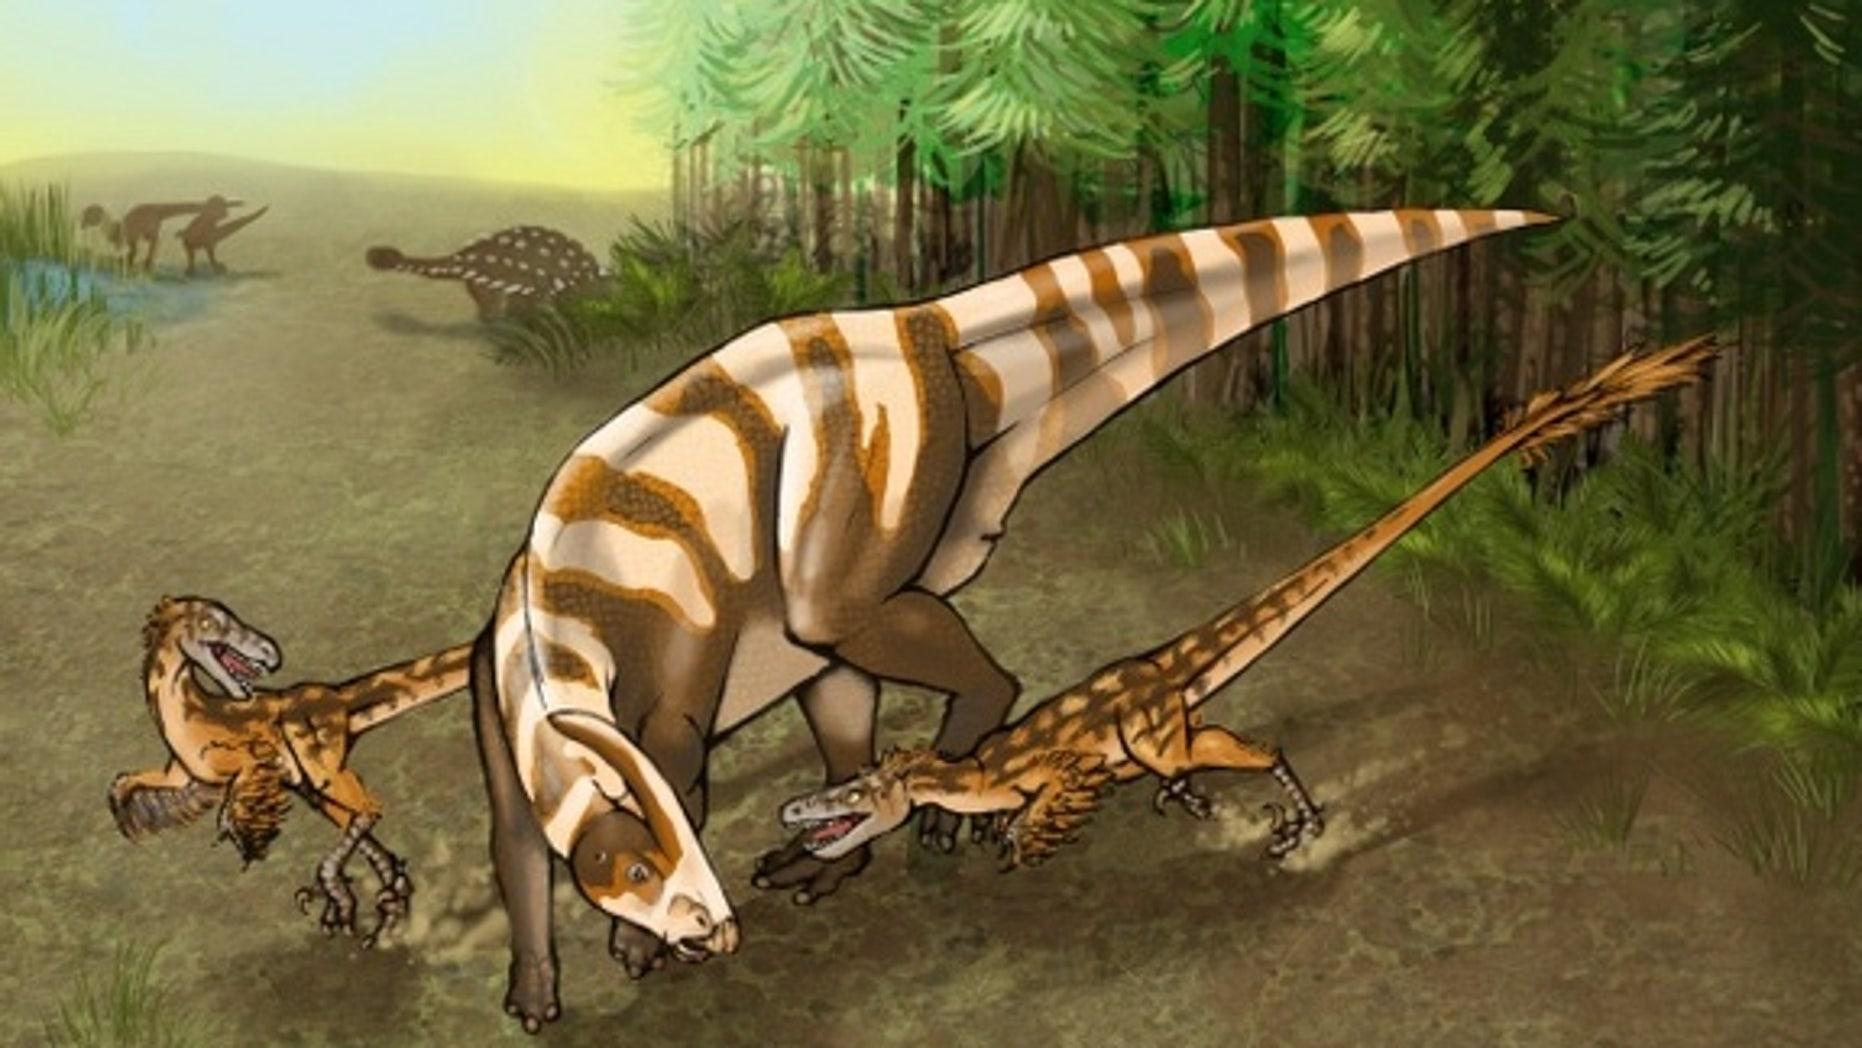 <em>Saurornitholestes sullivani</em> attacks a subadult hadrosaur in this illustration.